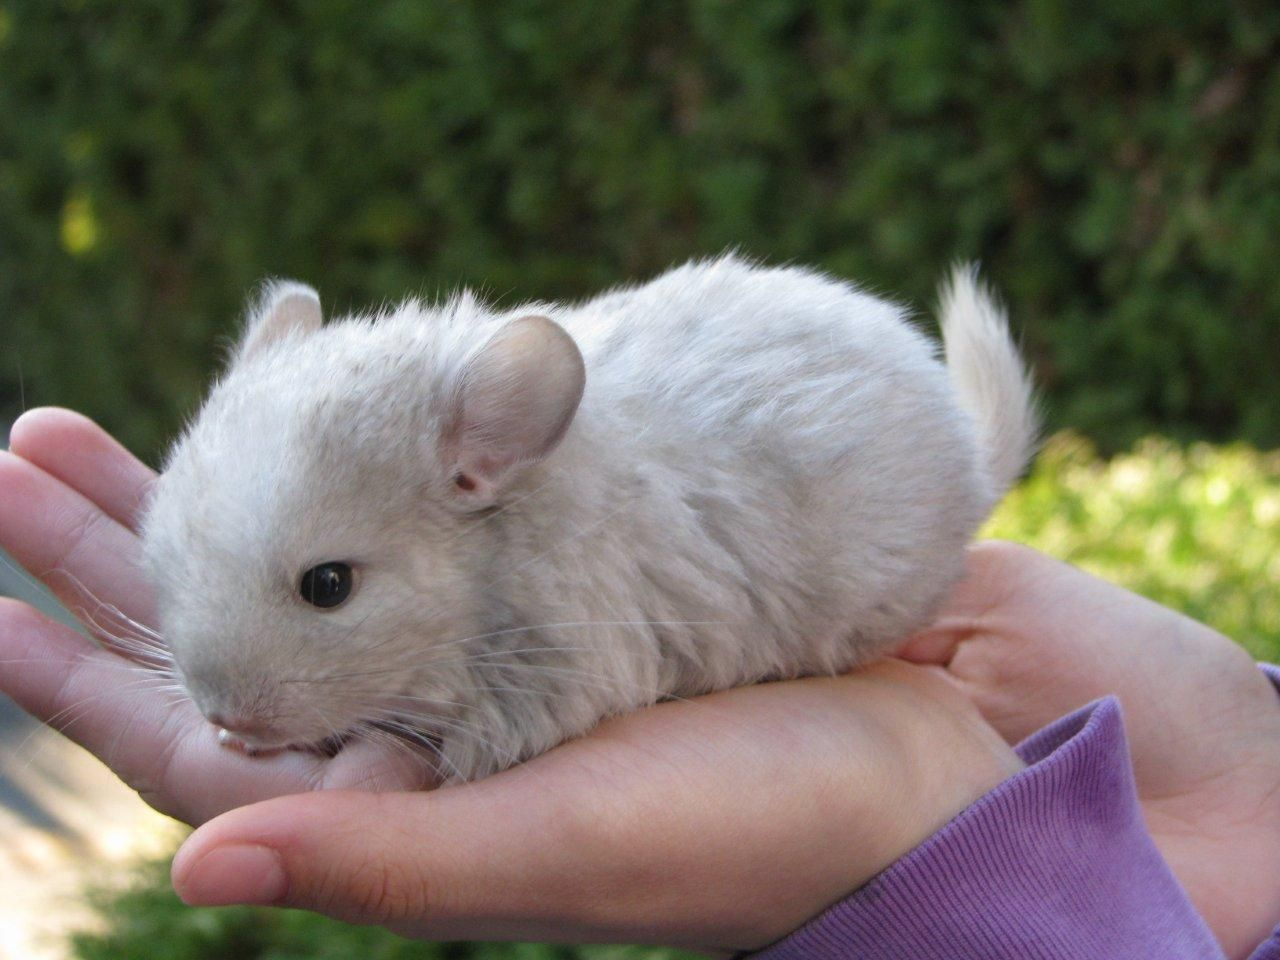 Super Adorable Baby Chinchilla 画像あり